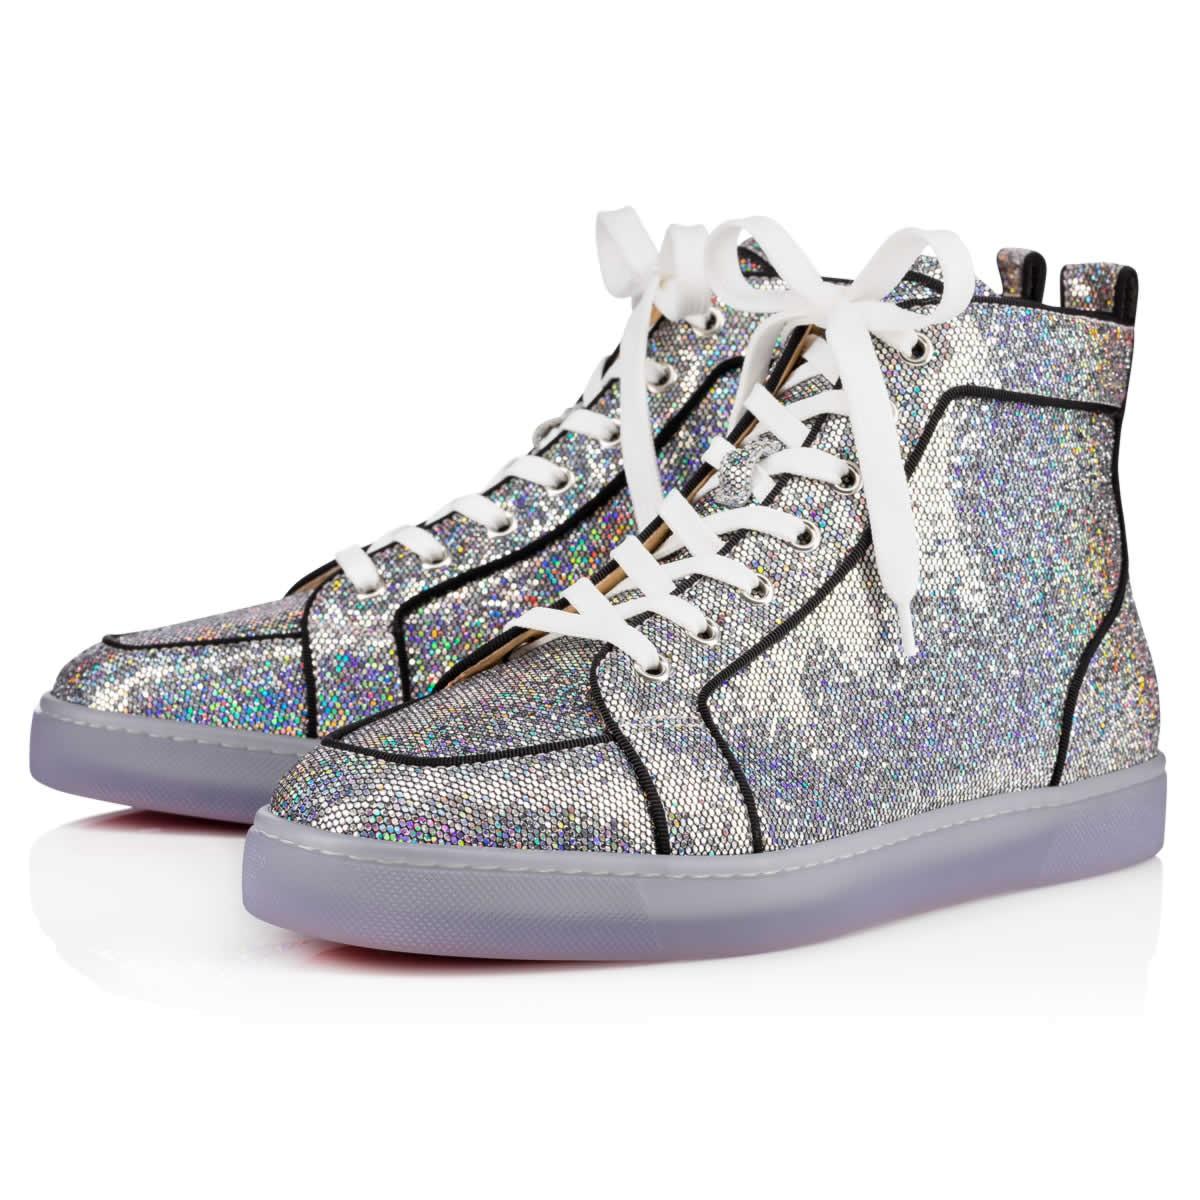 04b96f2916d Christian Louboutin Rantus Orlato Flat Multi Glitter Disco Ball - Men Shoes  - In Multicolor